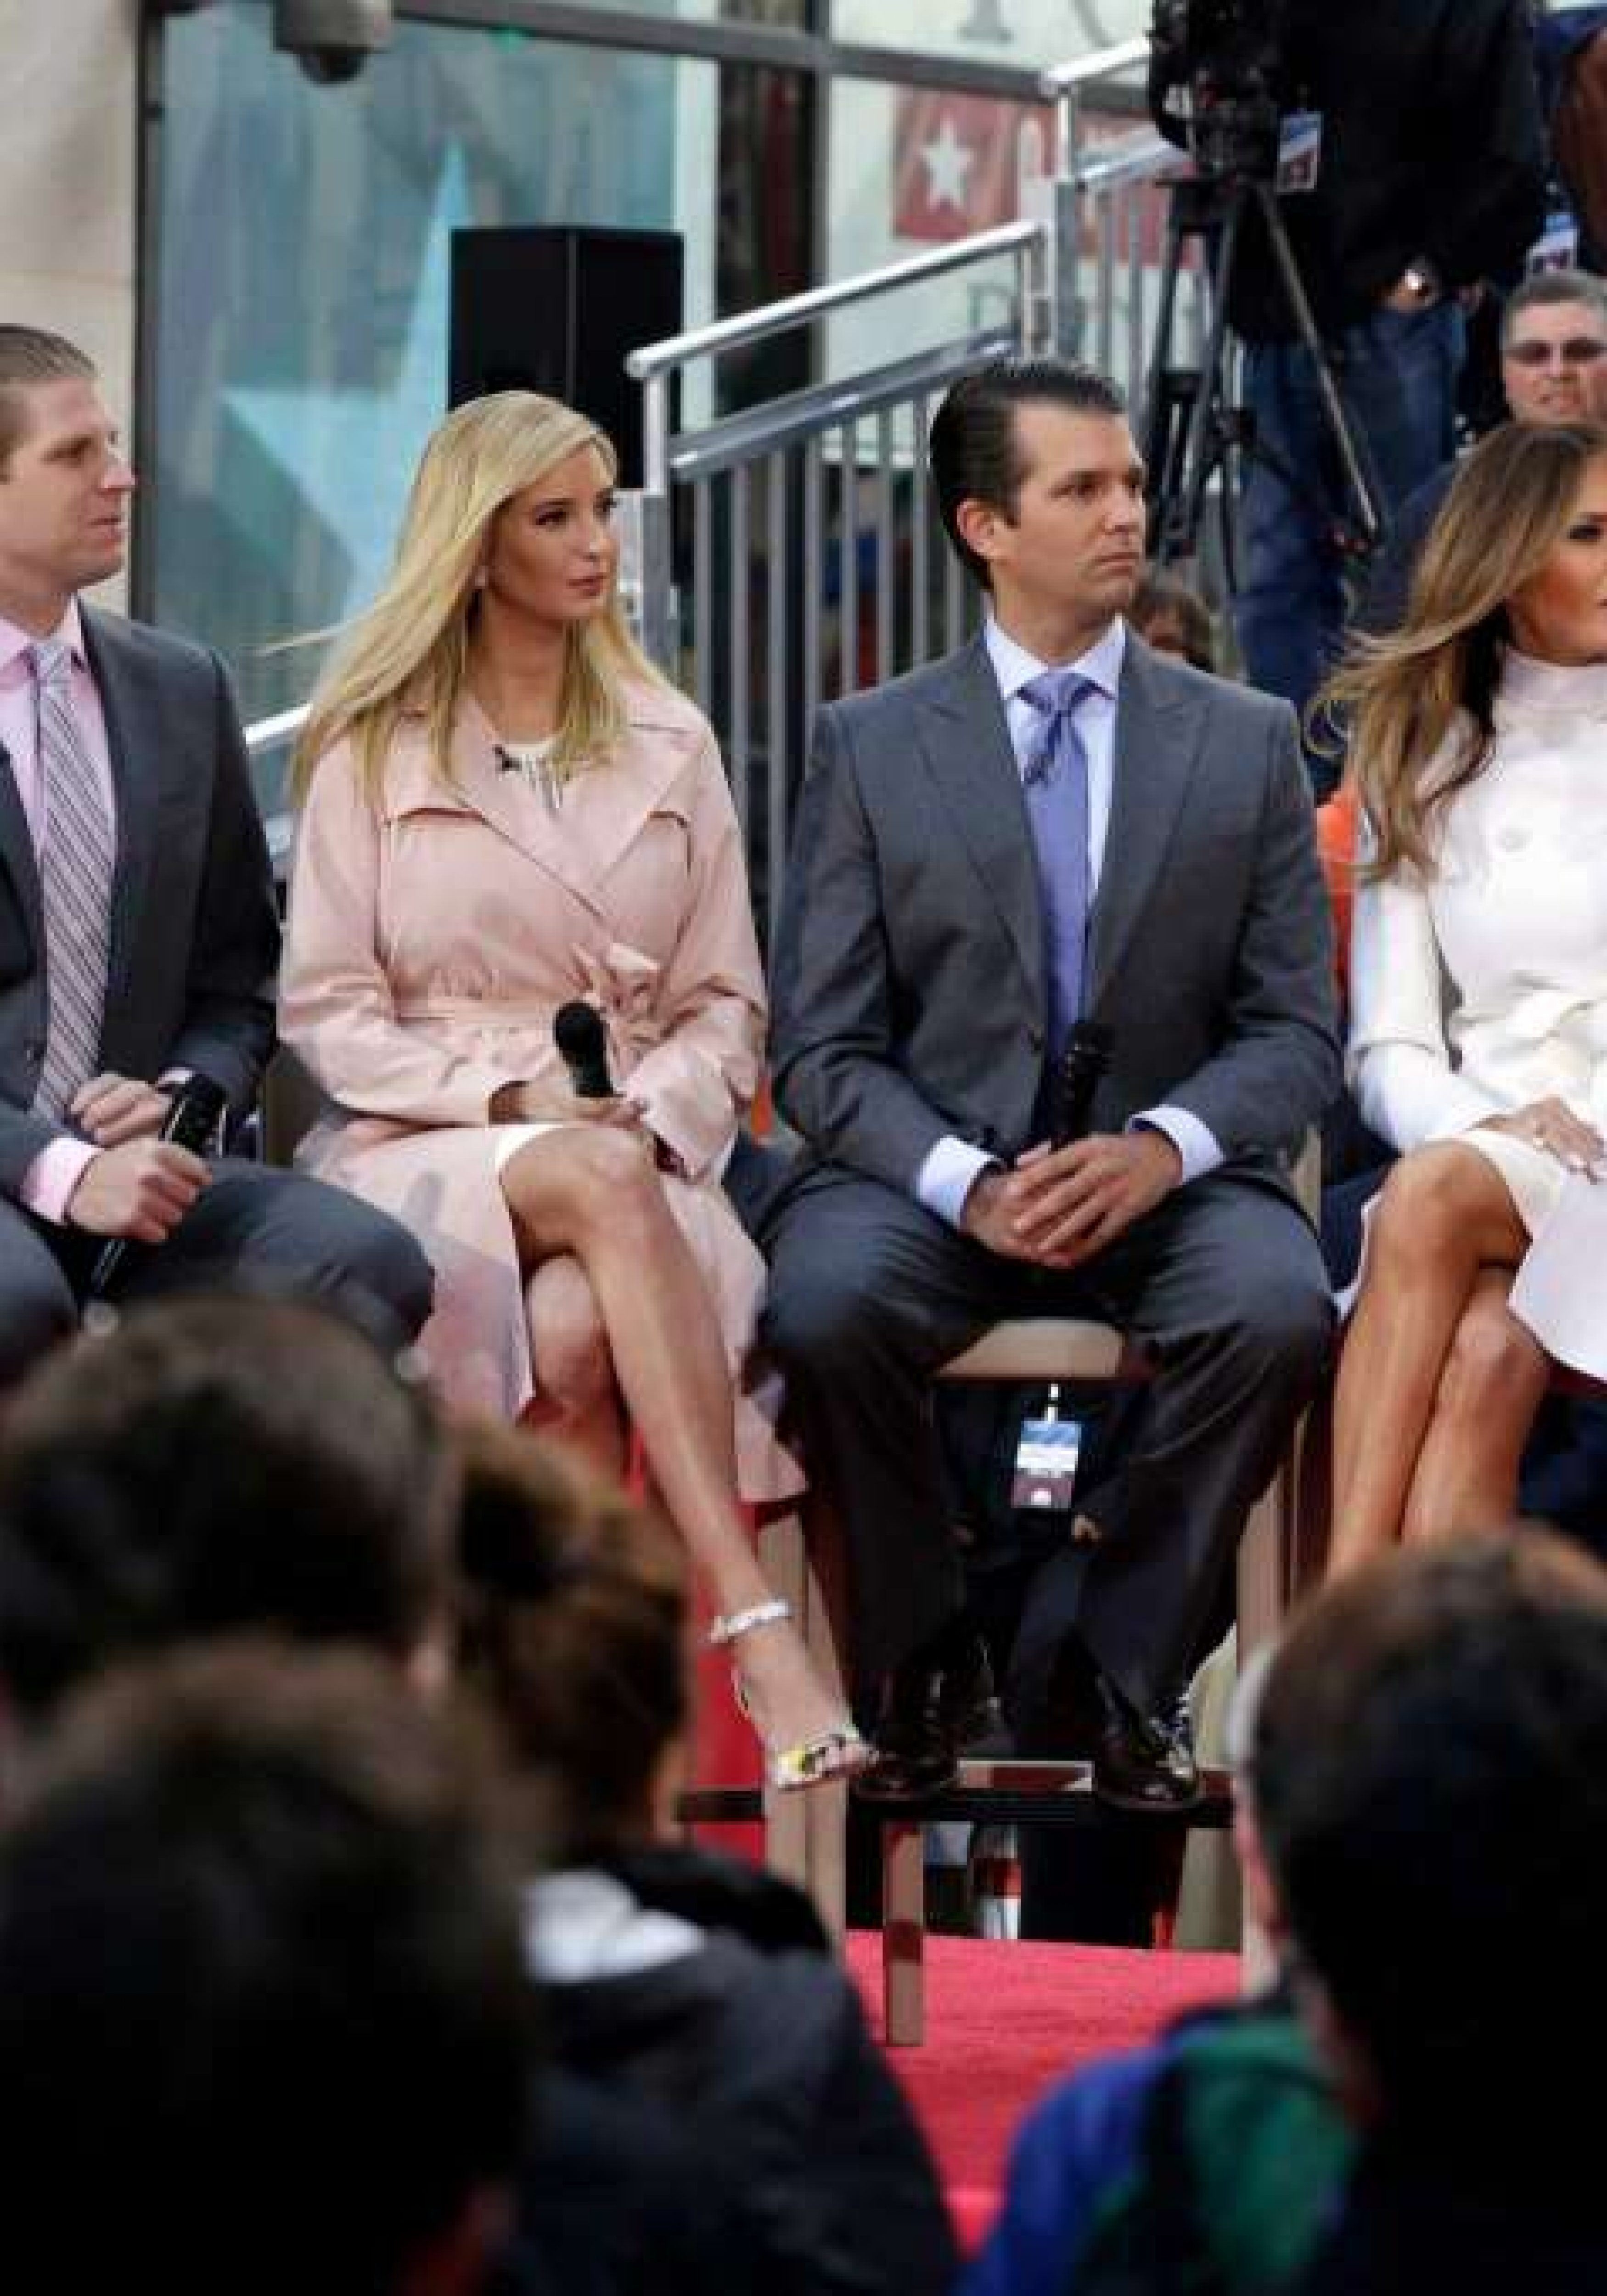 trump-family-3500x5000.jpg